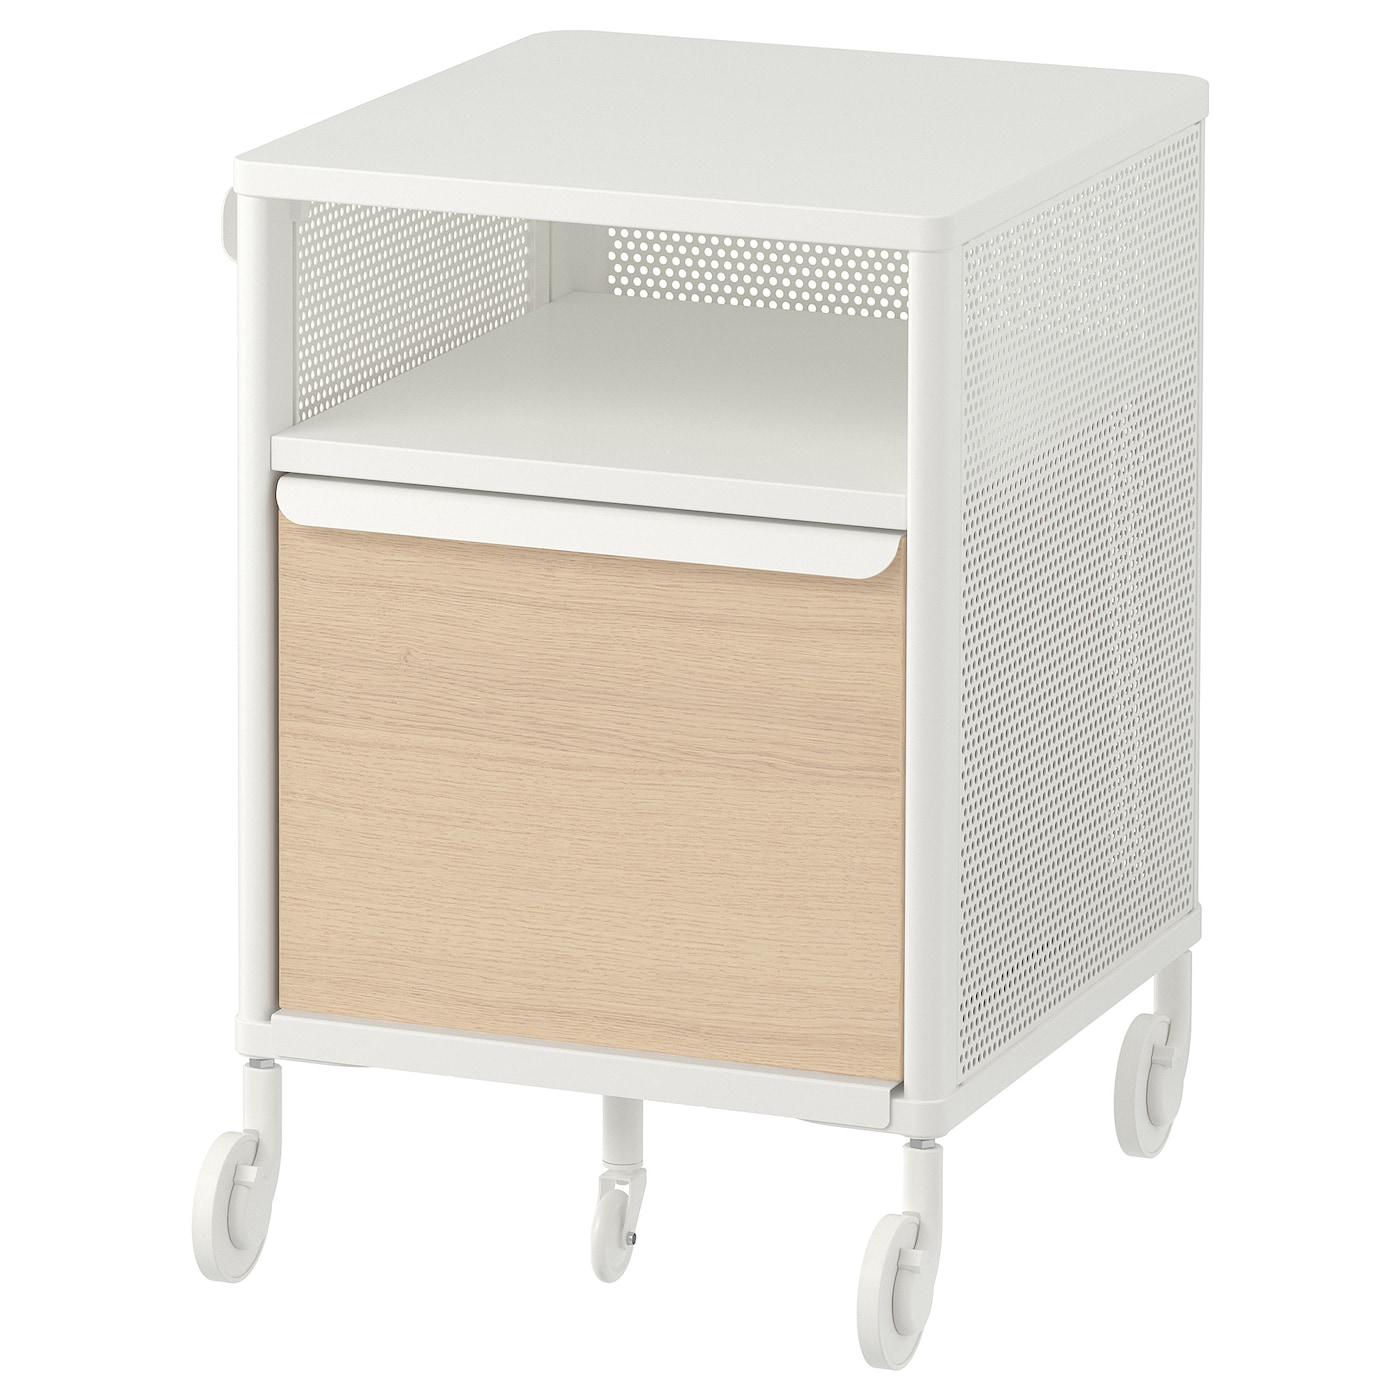 t-storage-unit-with-smart-lock-mesh-white__0643462_PE701894_S5